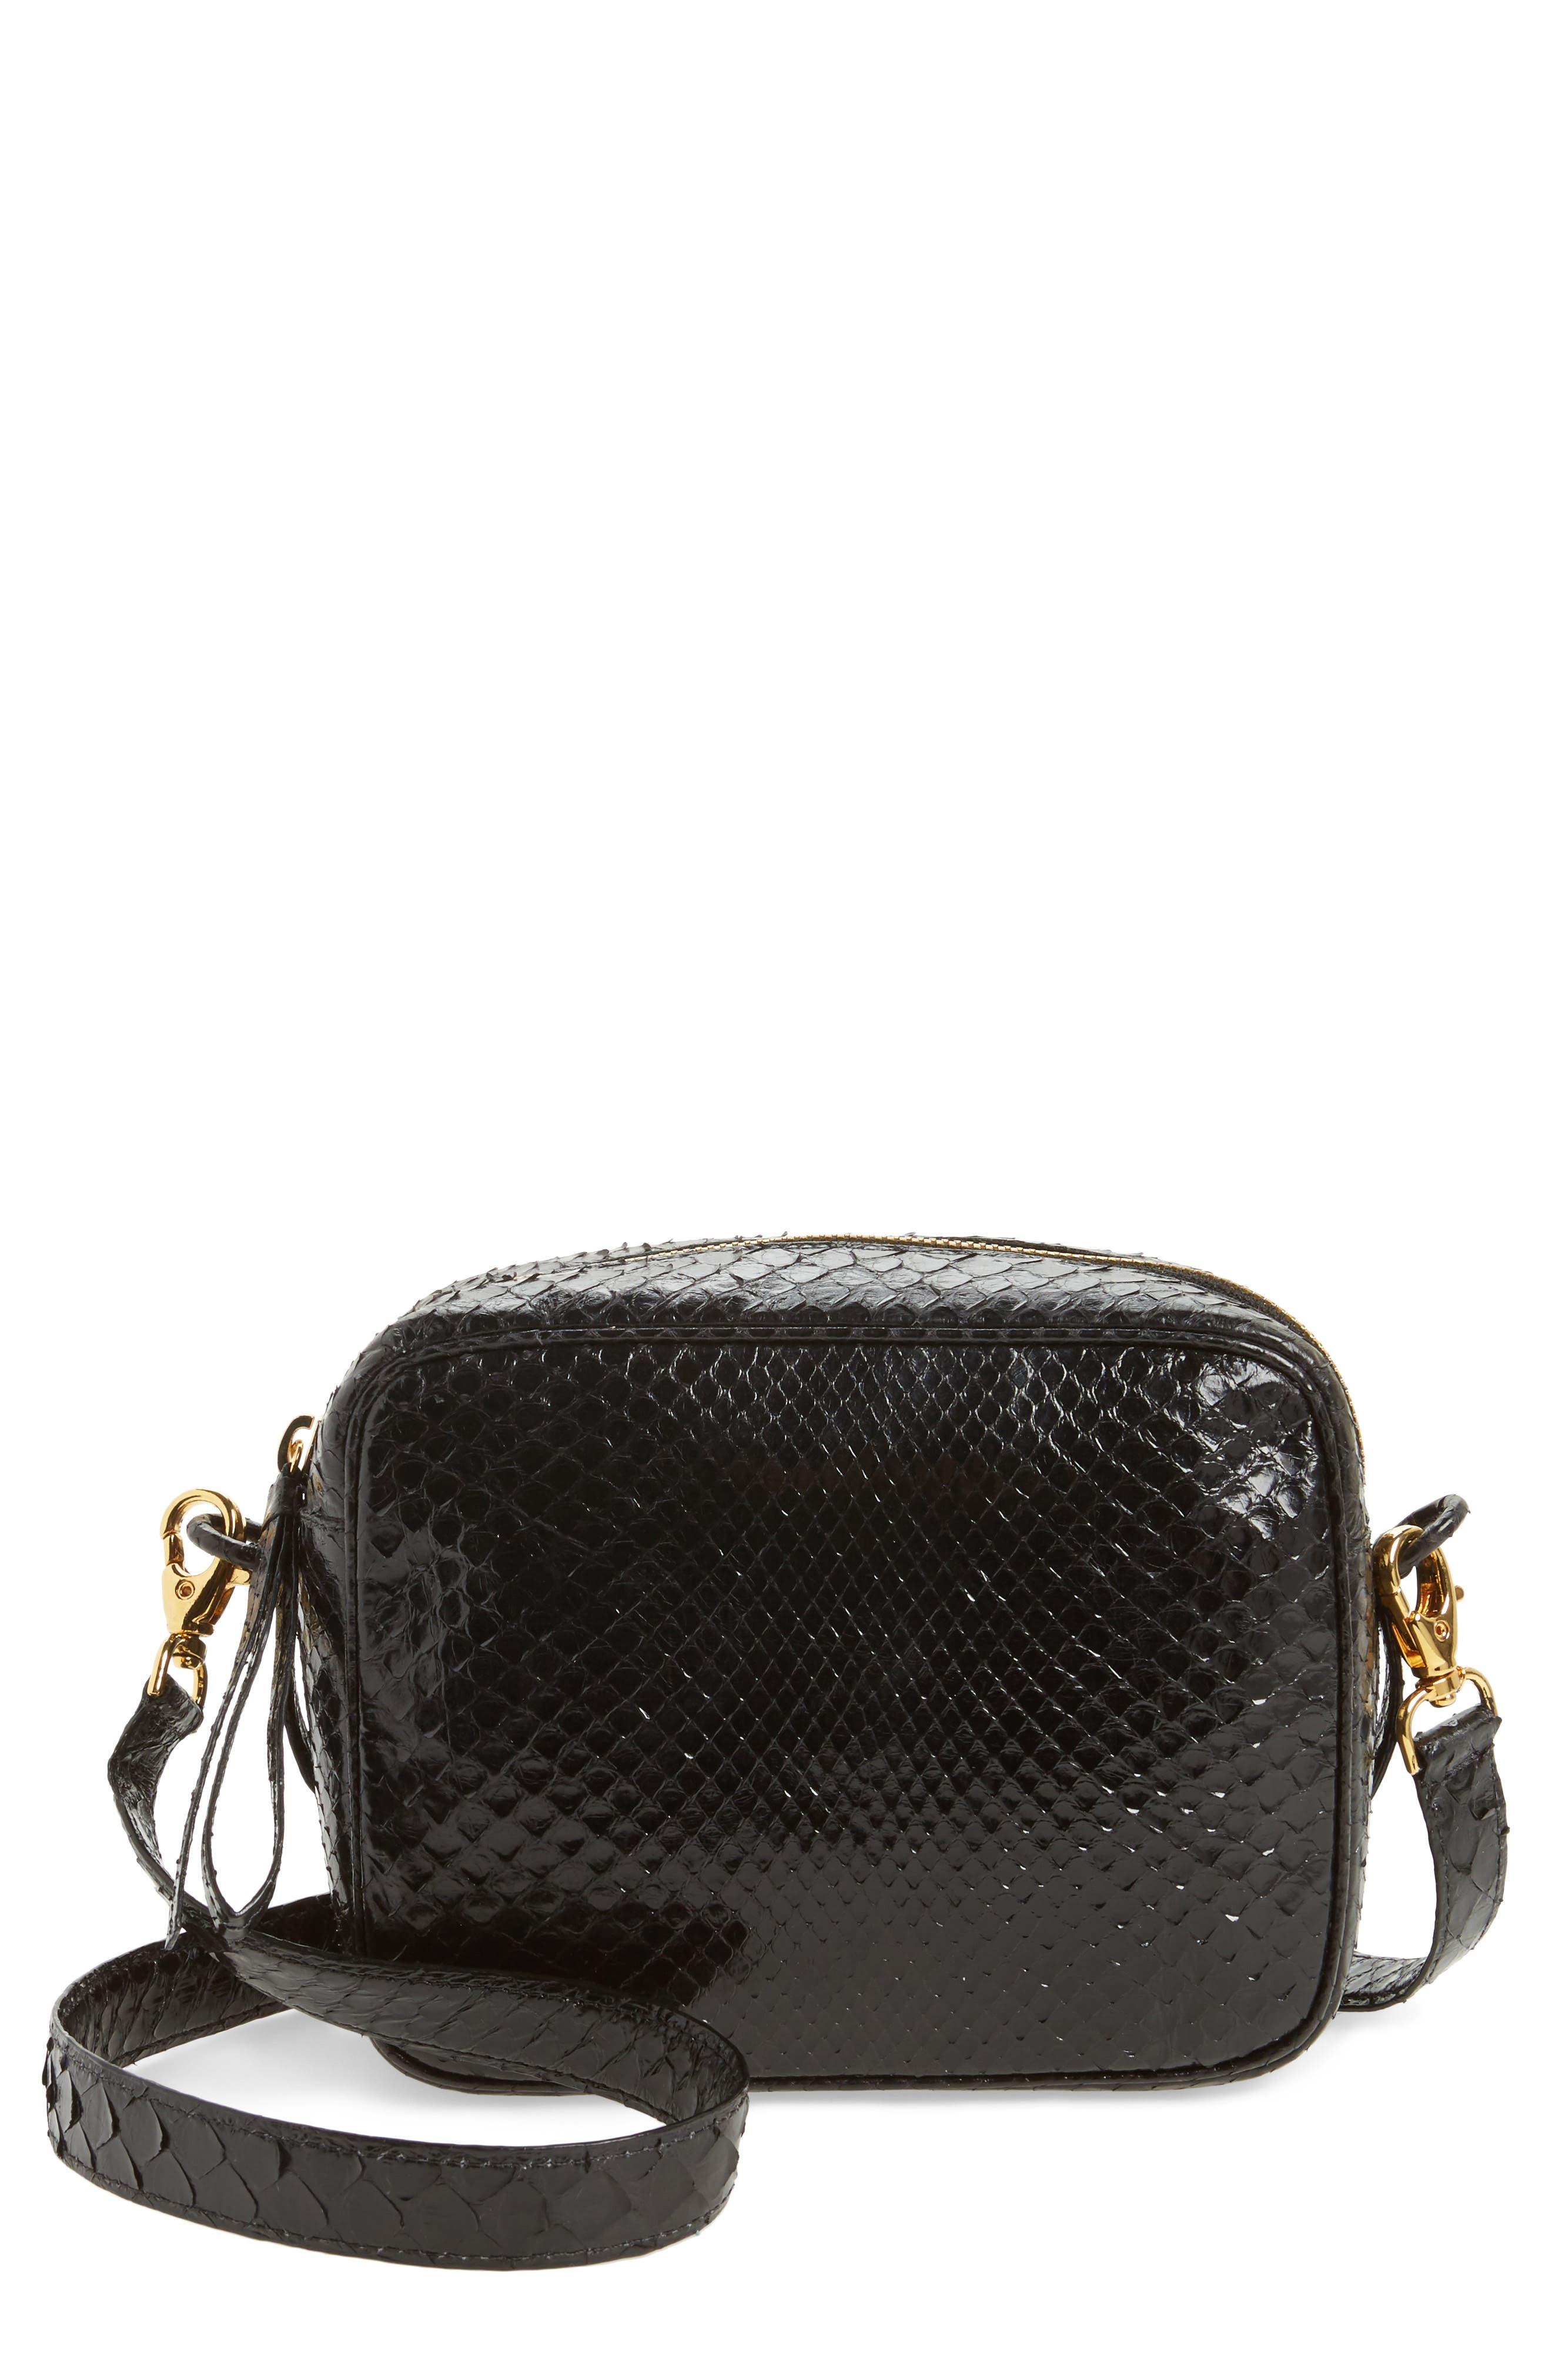 Genuine Python Shoulder Bag,                             Main thumbnail 1, color,                             Black